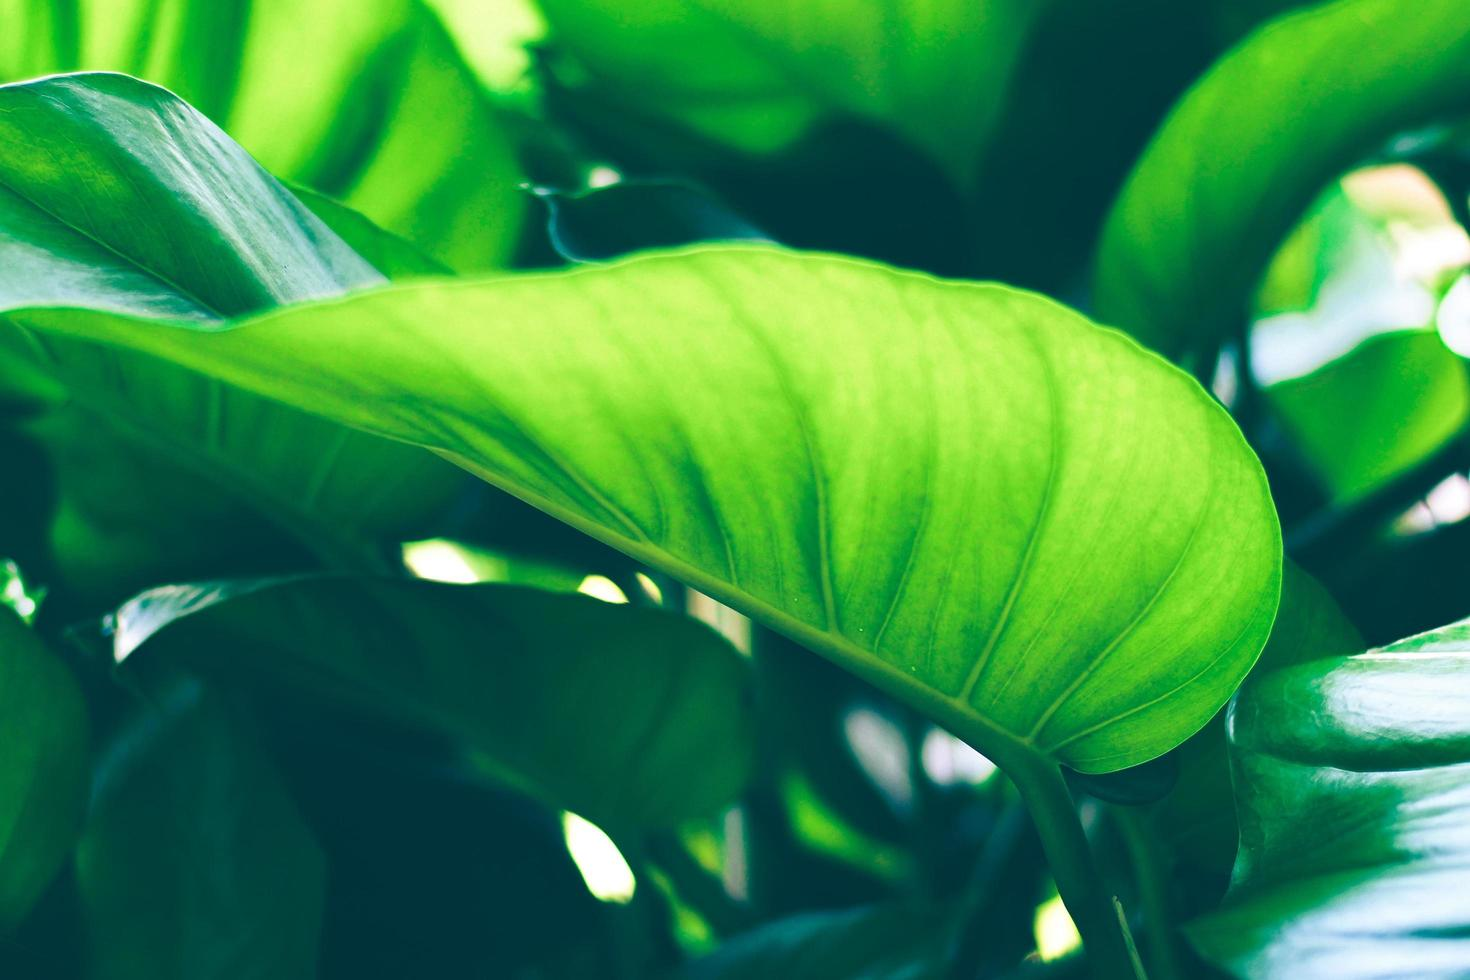 Sun shining through a green leaf photo